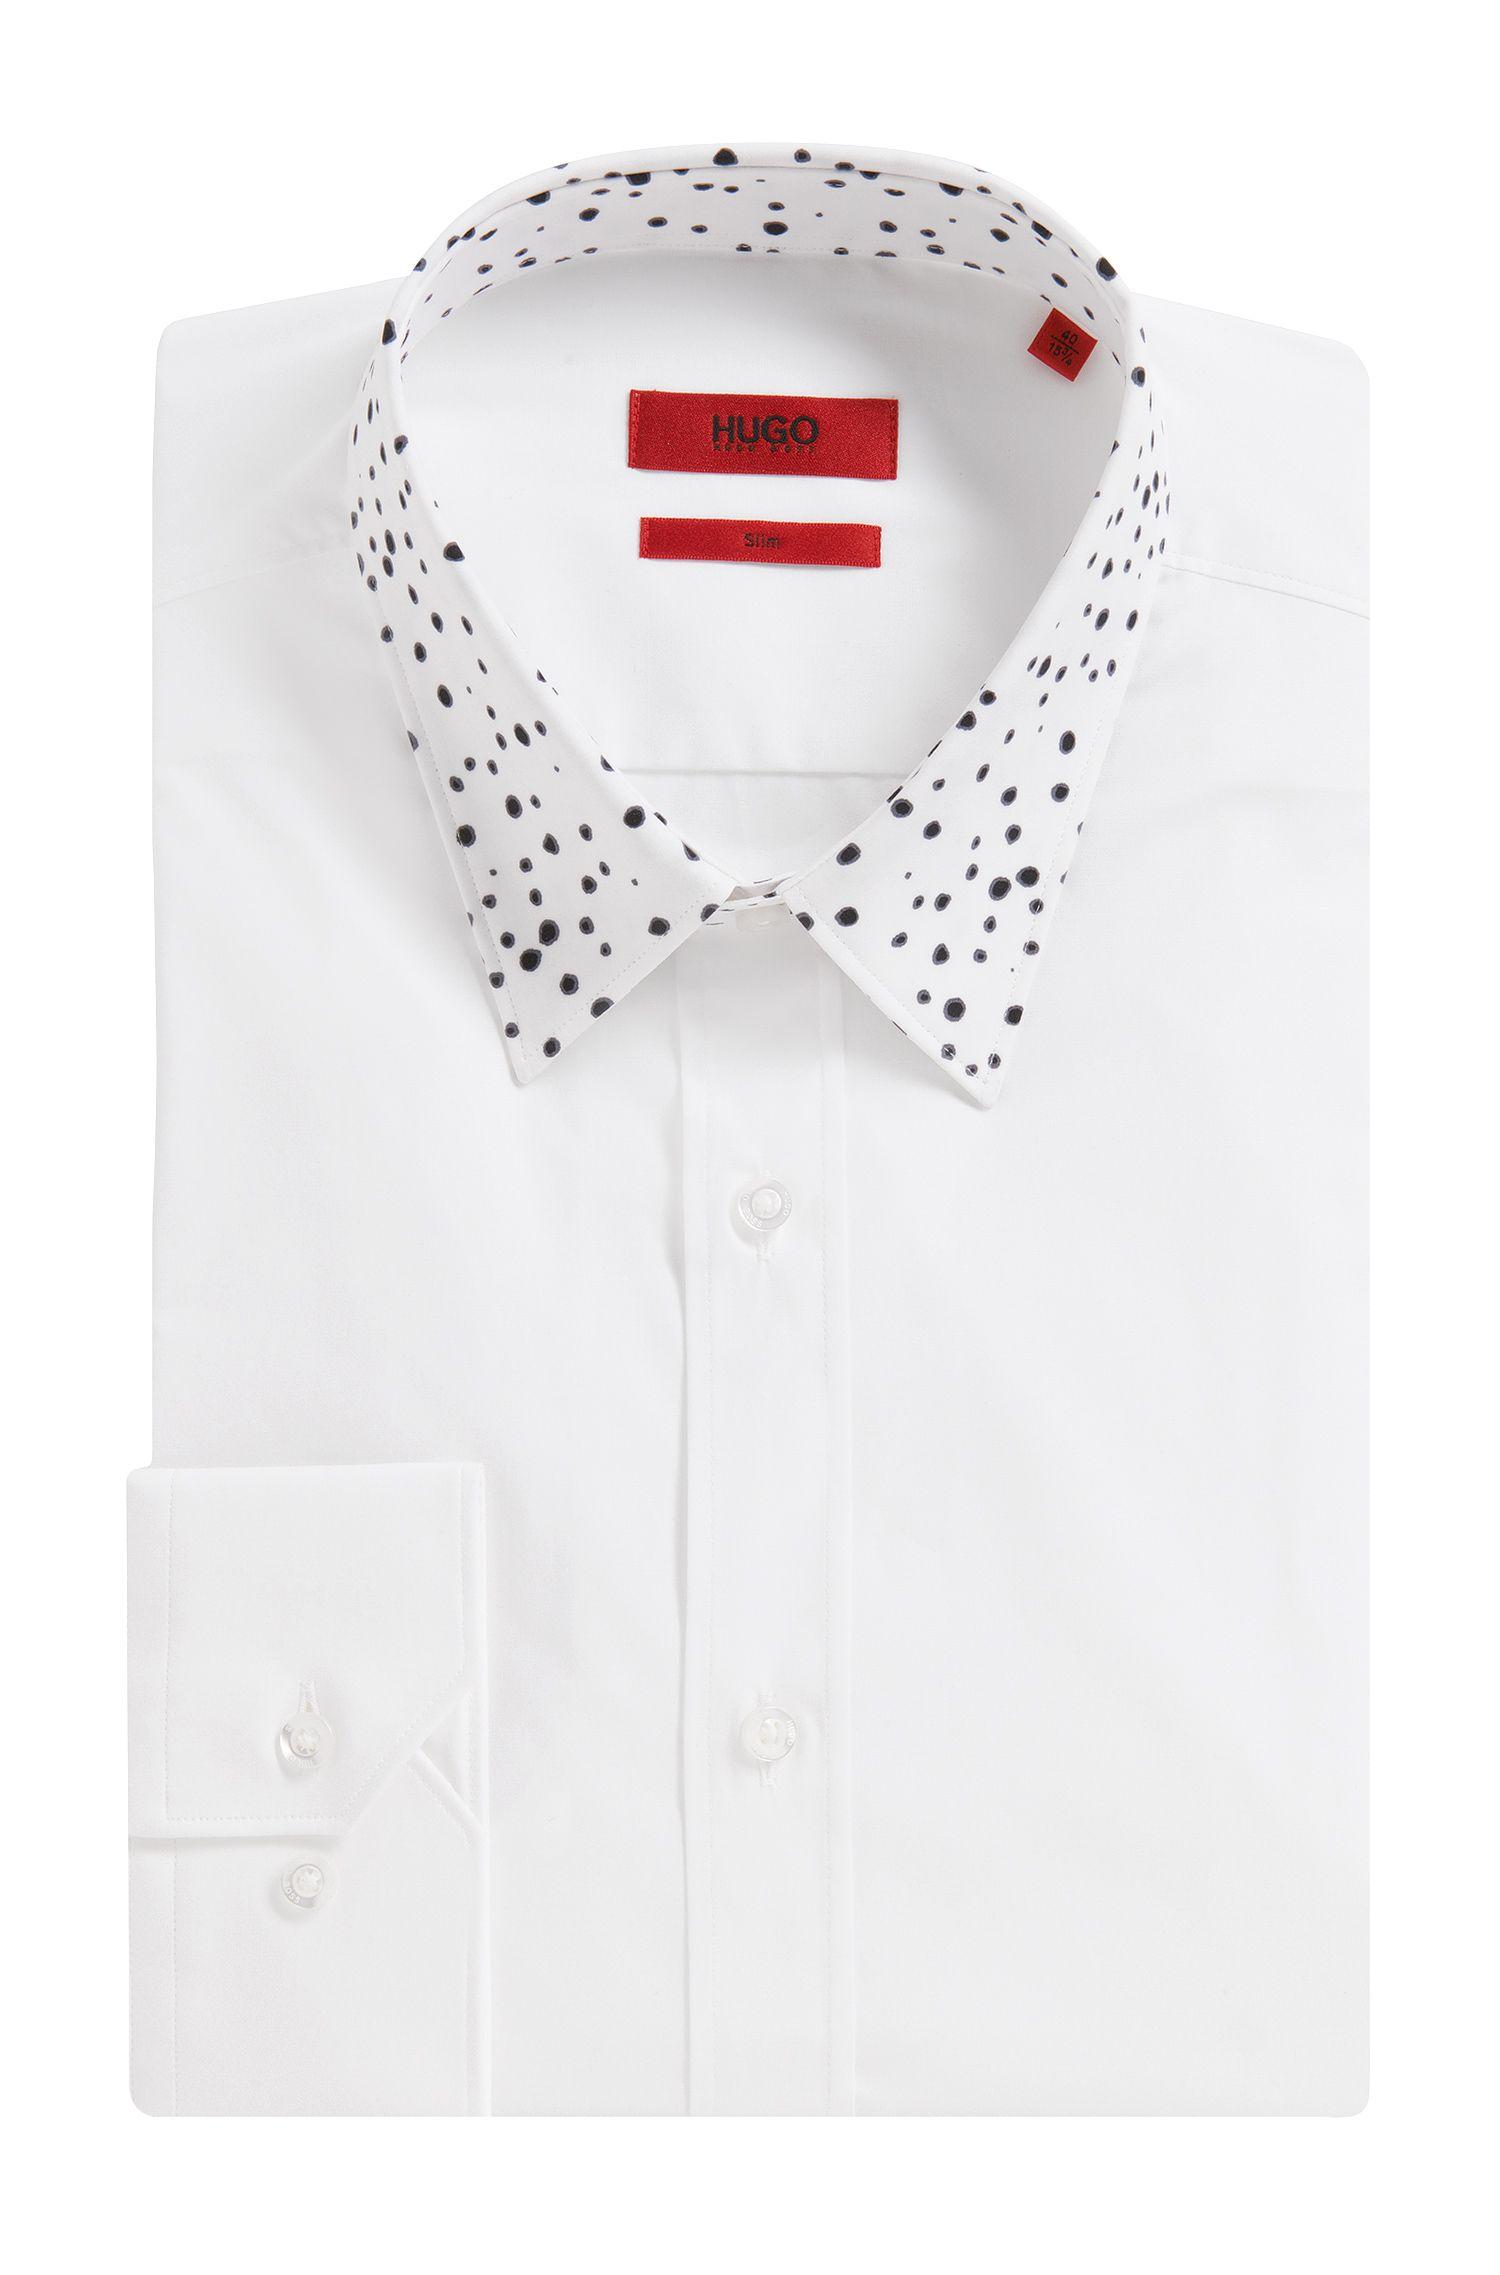 'Elisha' | Extra Slim Fit, Stretch Cotton Button Down Shirt